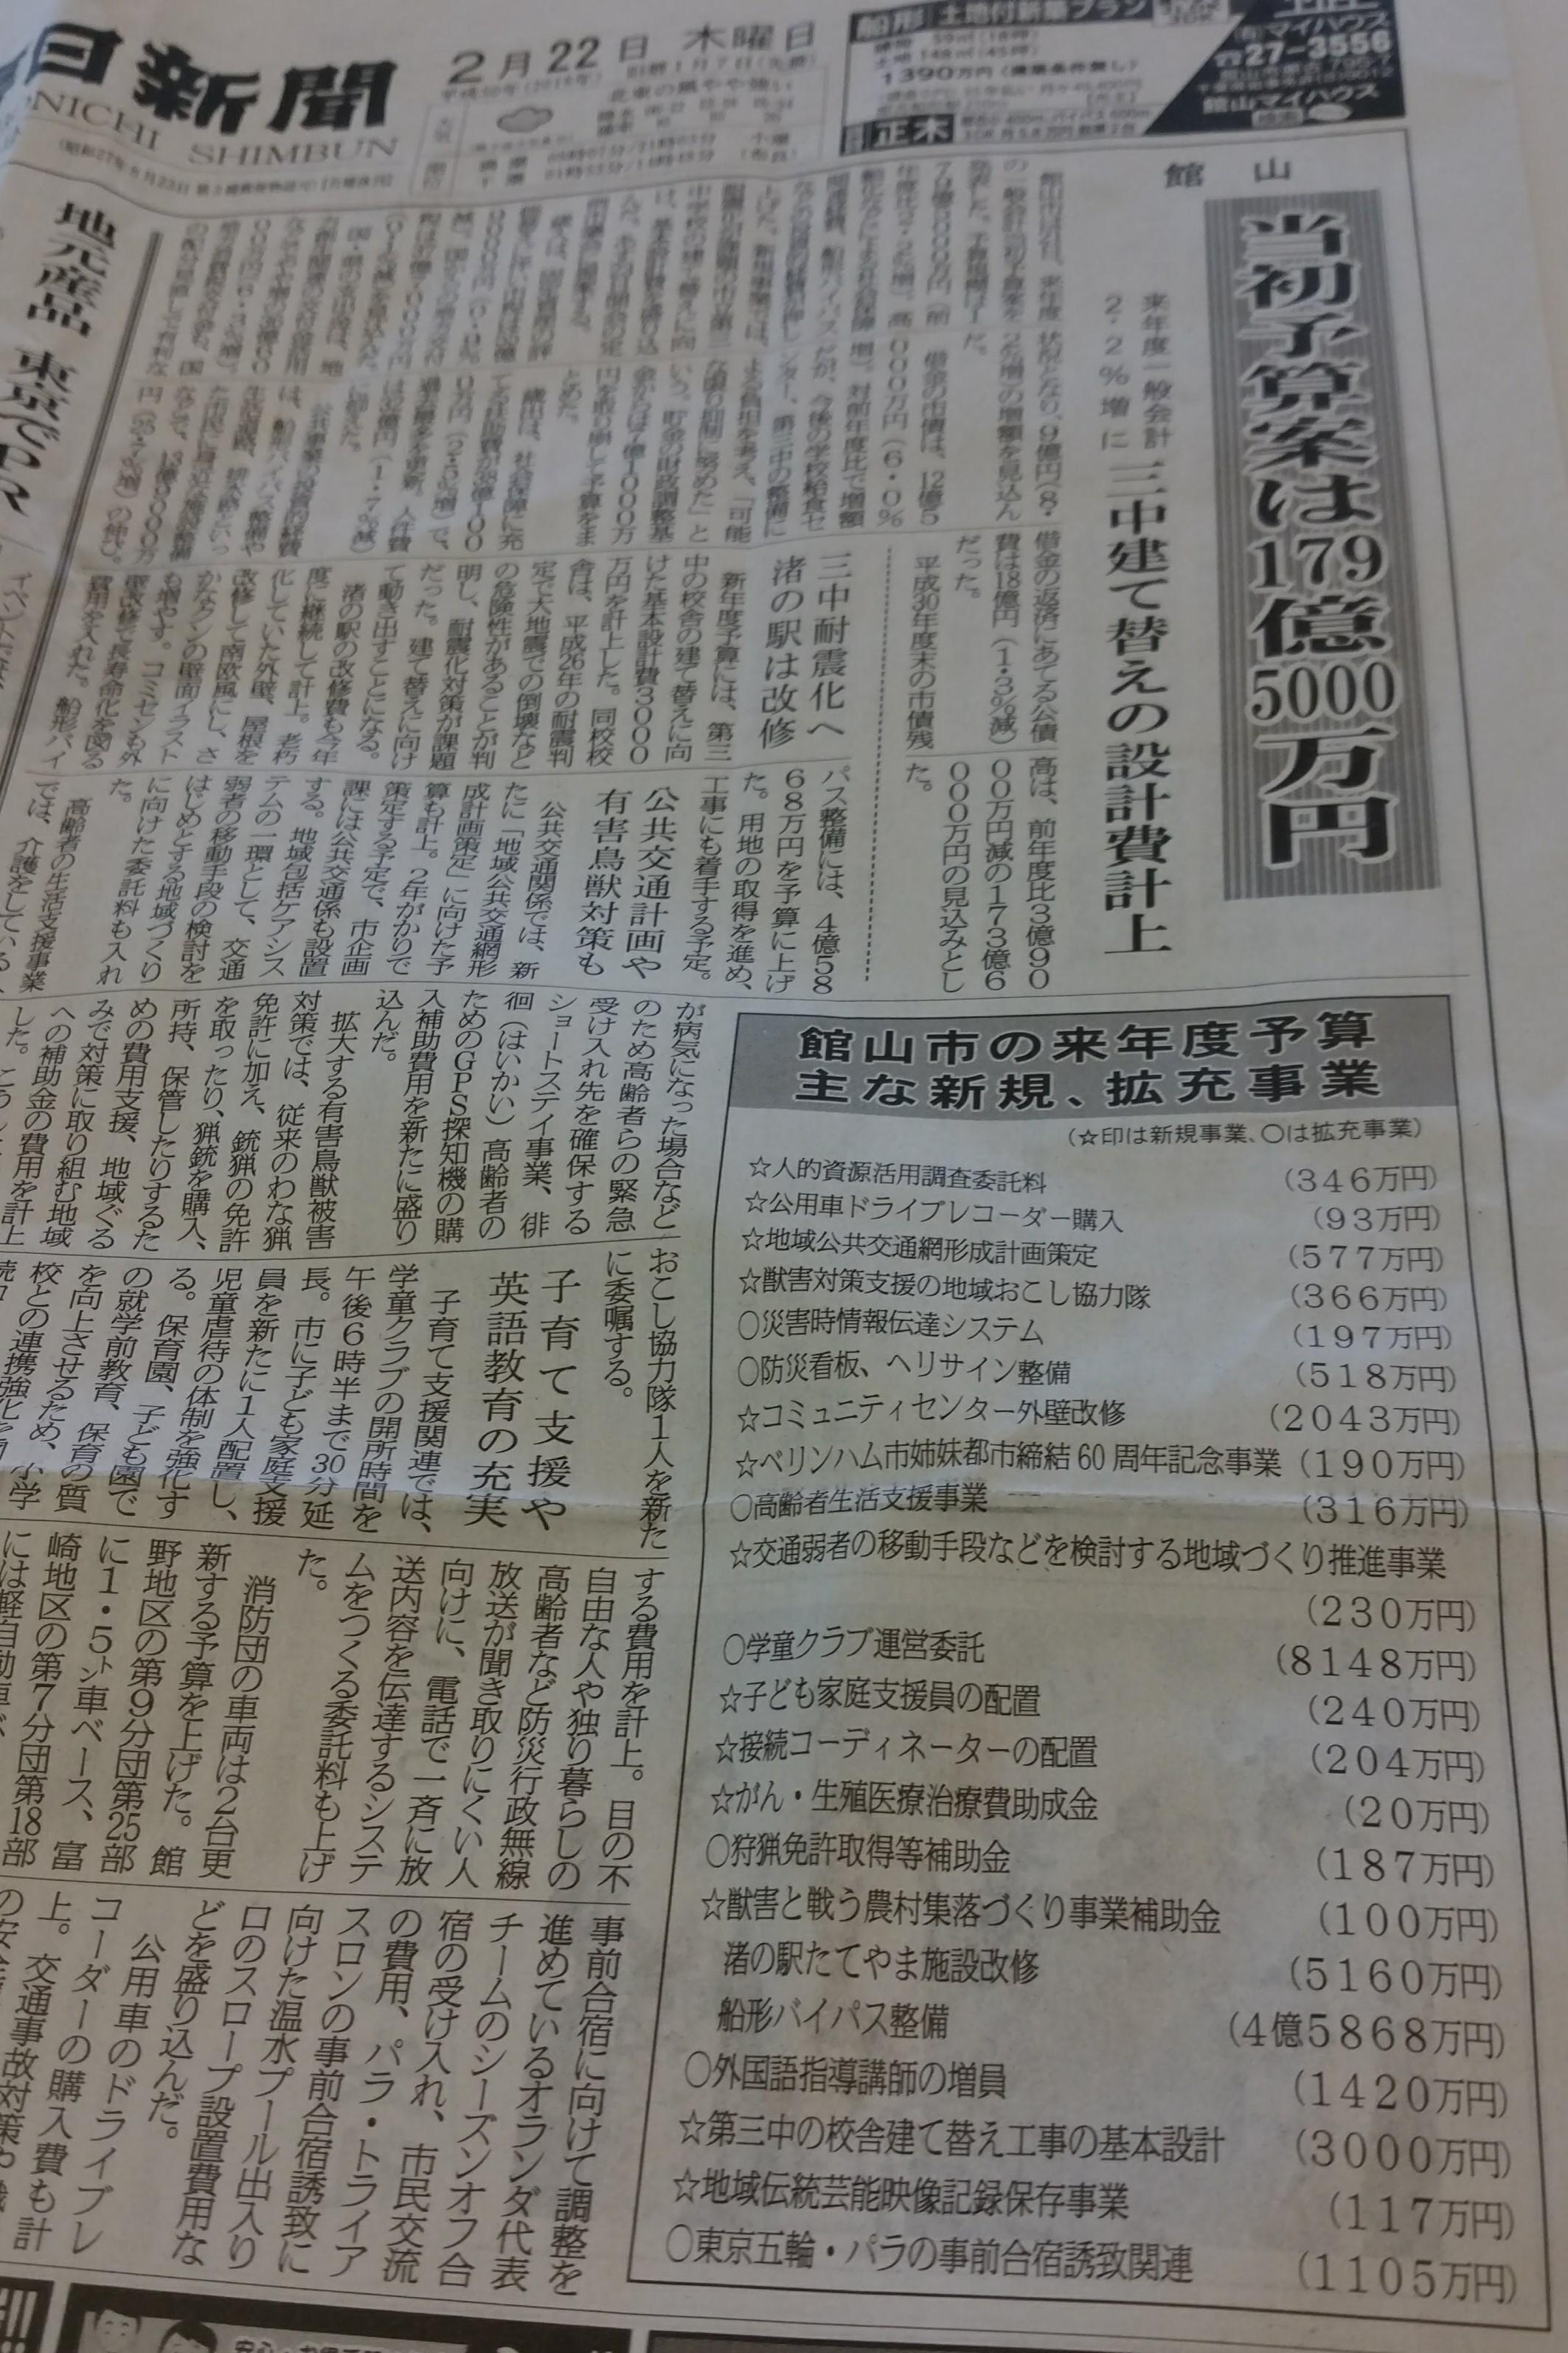 H30予算案 房日新聞